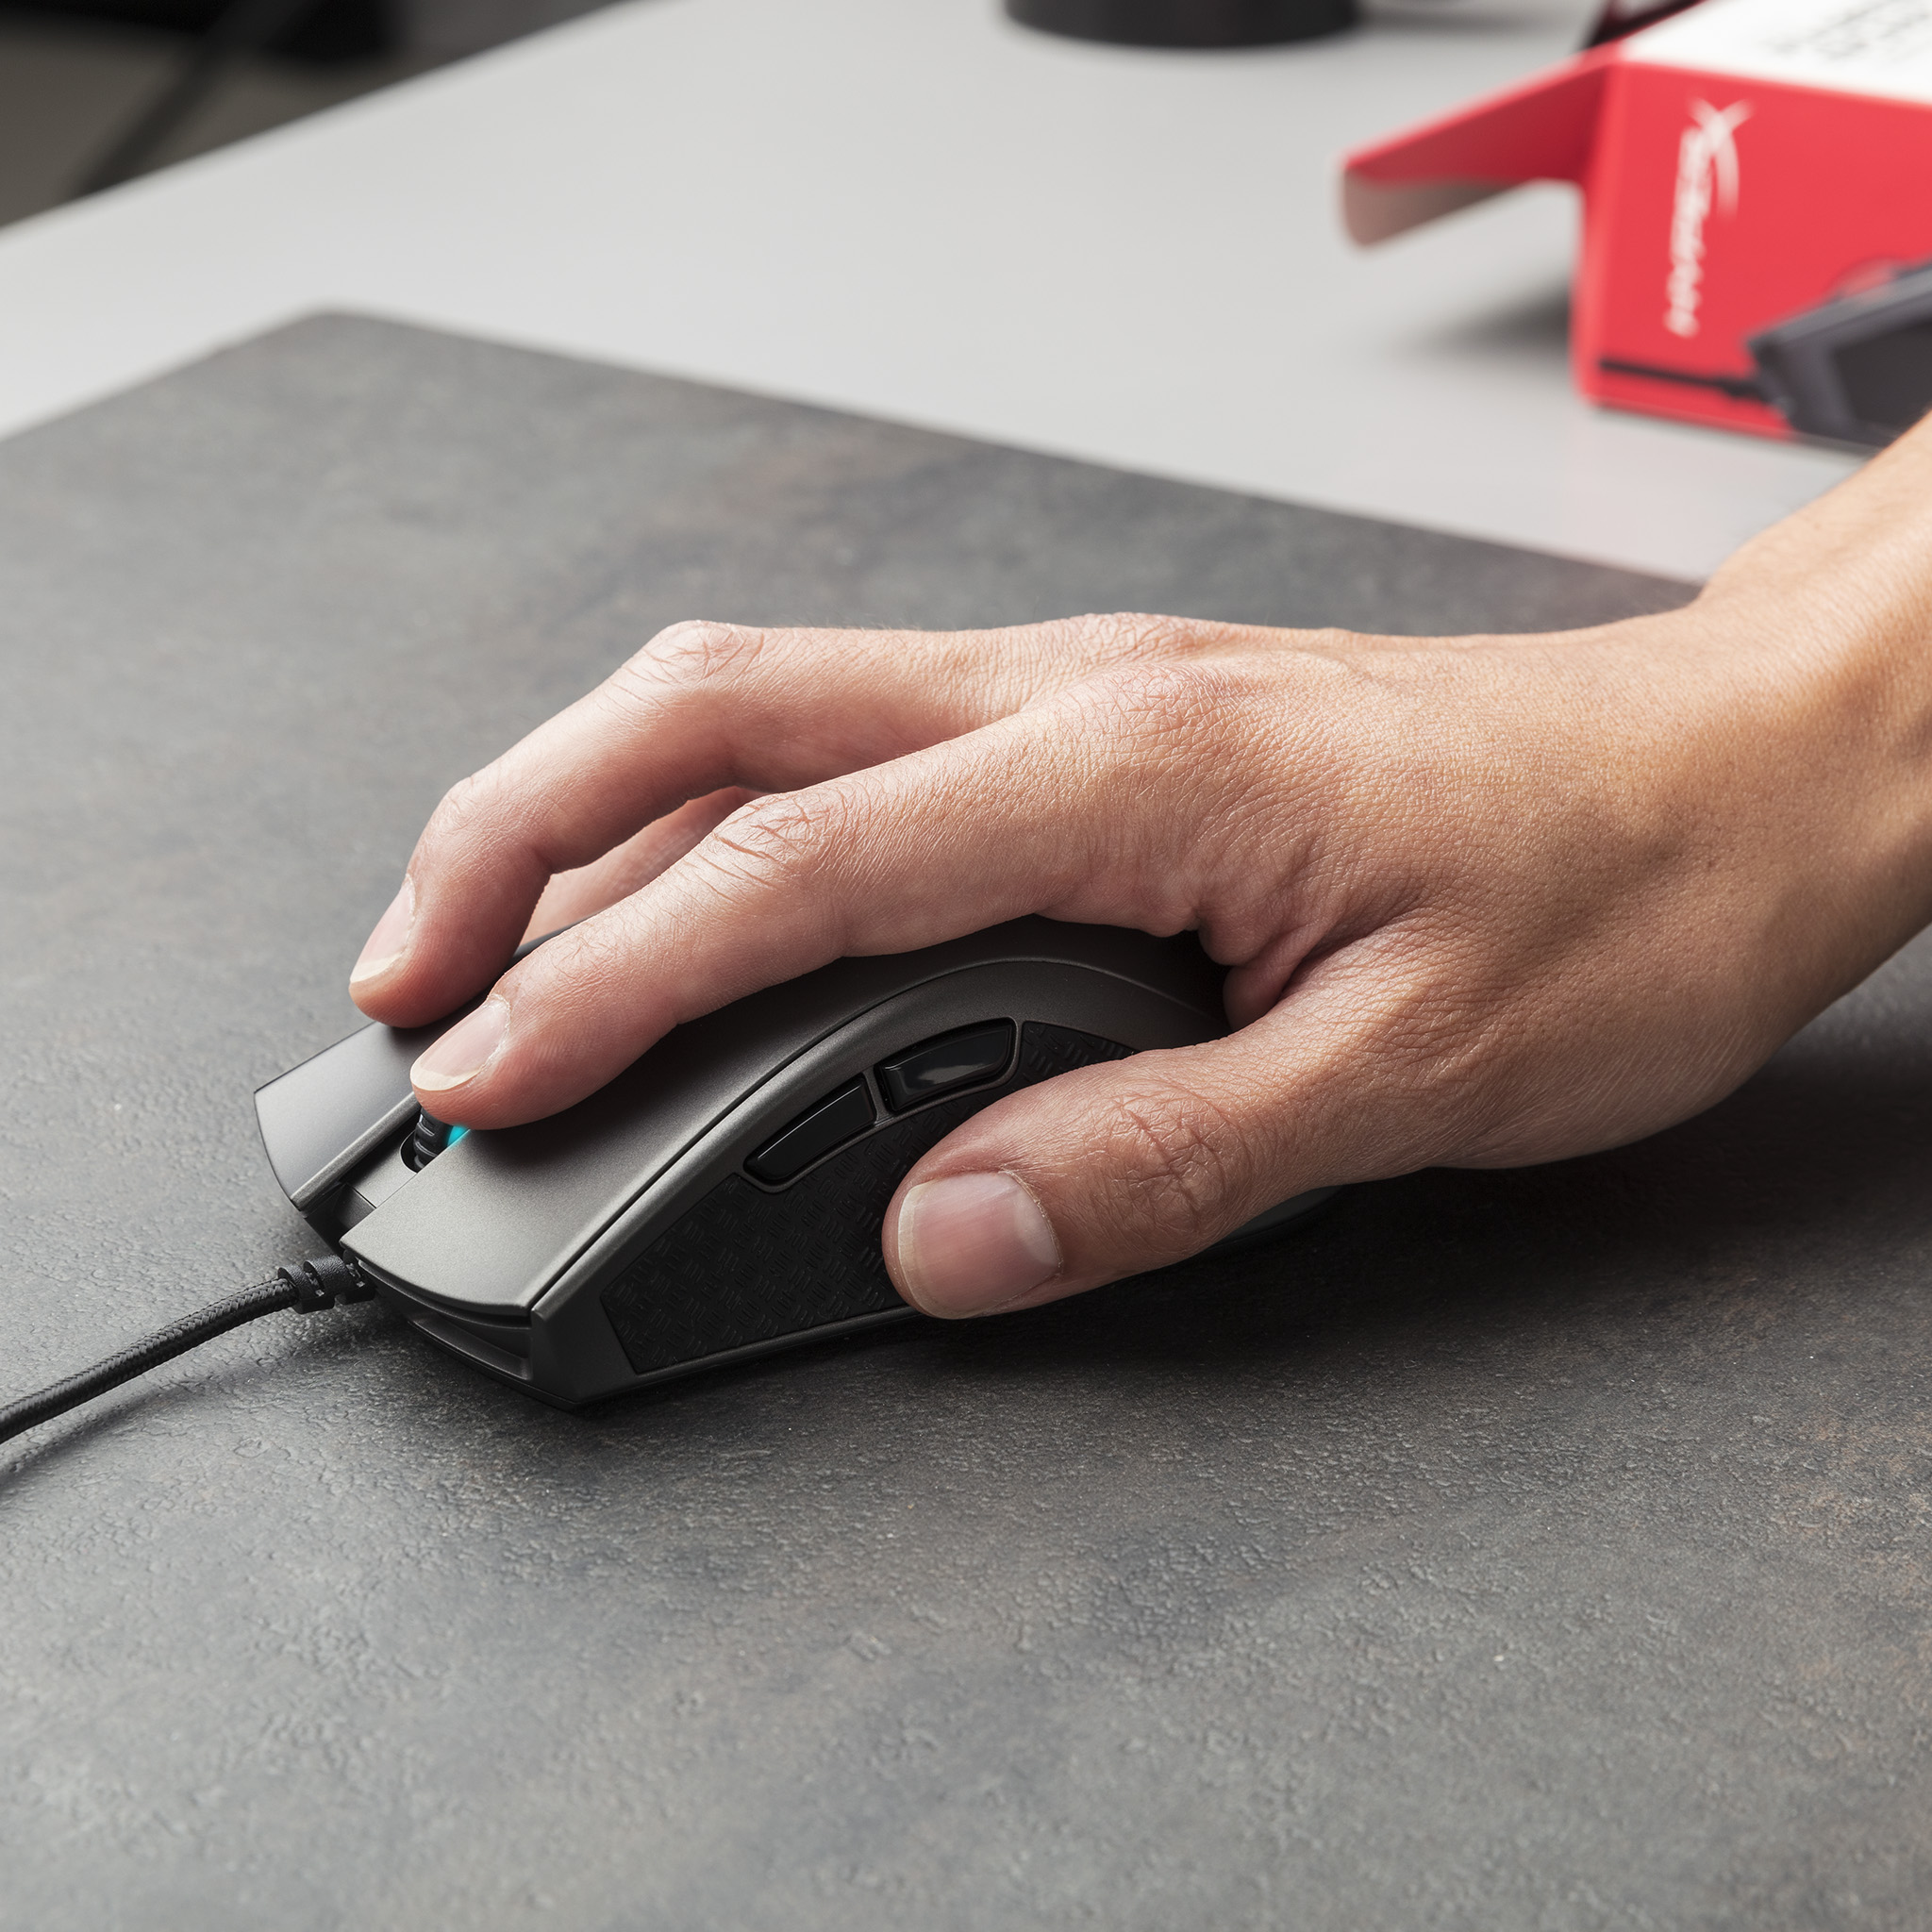 Mouse HyperX Pulsefire FPS Pro 16000DPI RGB